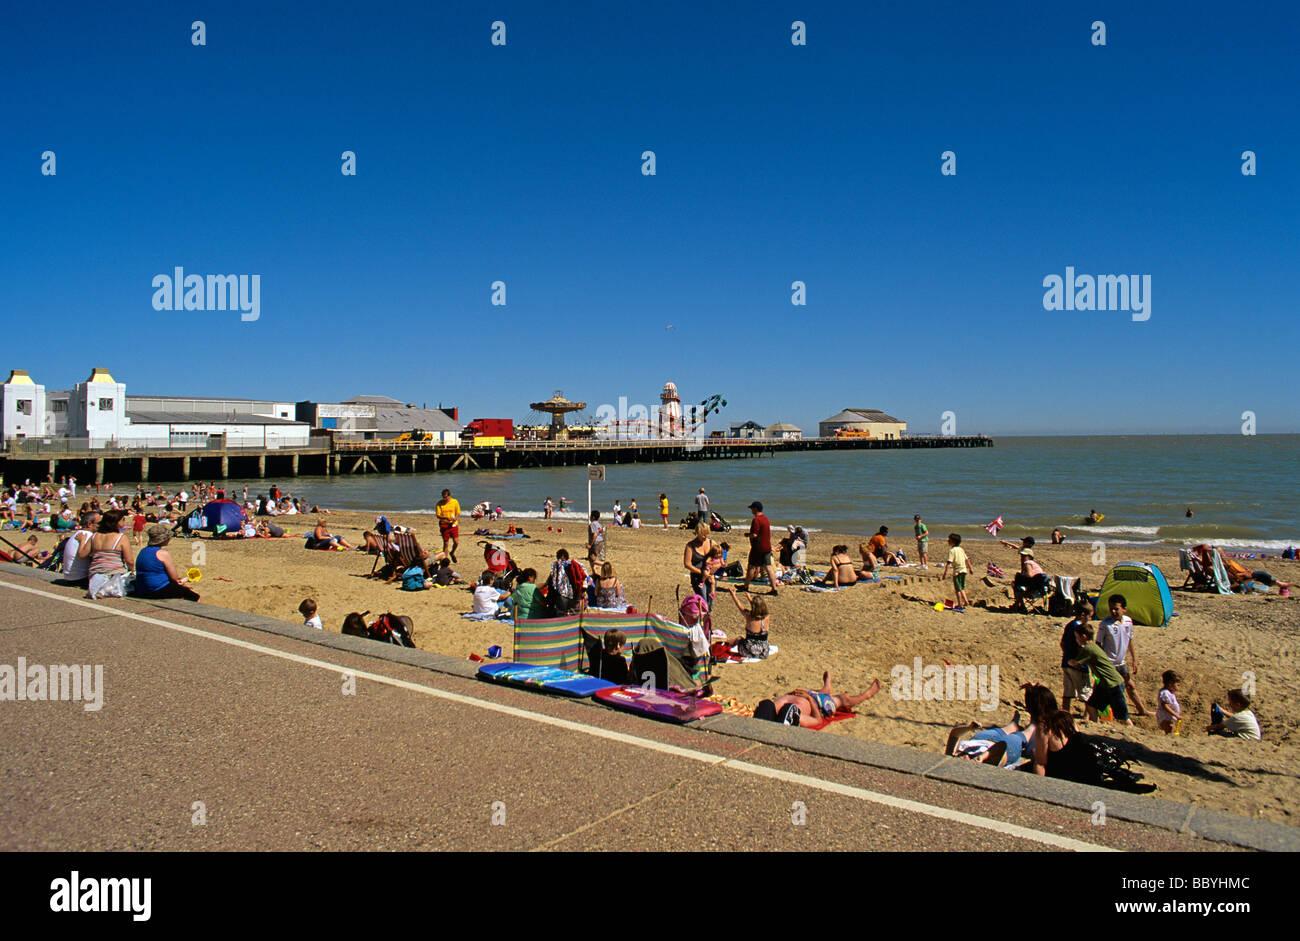 Beach promenade and amusement Pier at Clacton on Sea on the Essex coast - Stock Image